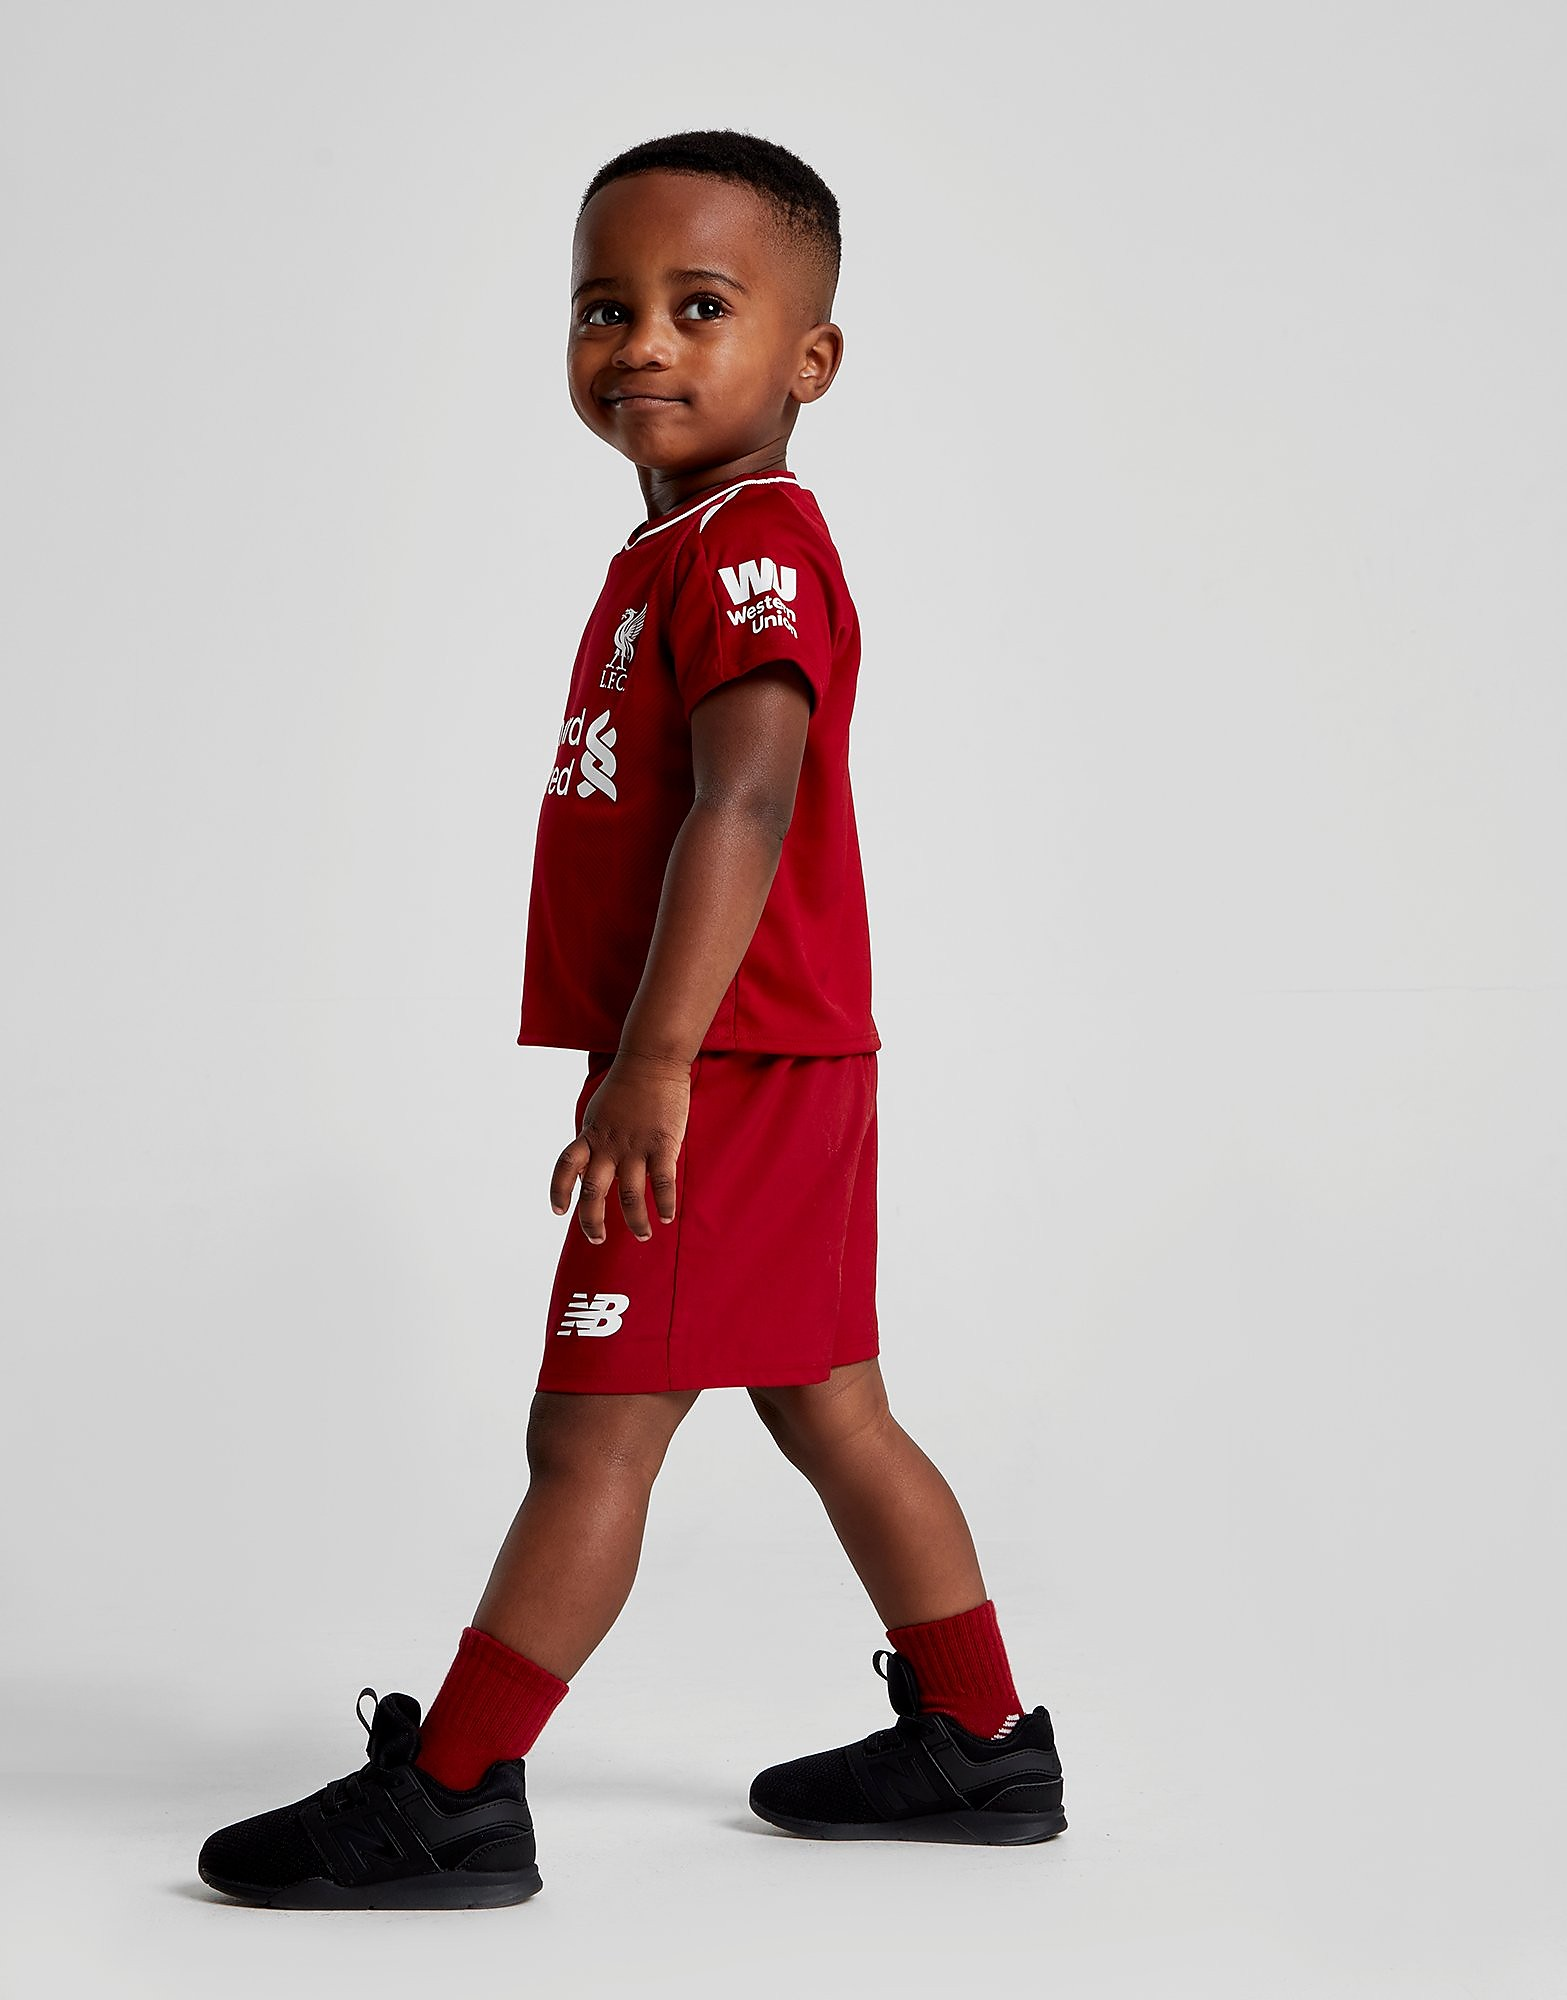 New Balance Liverpool FC 2018 Completo Bebè PREORDINE